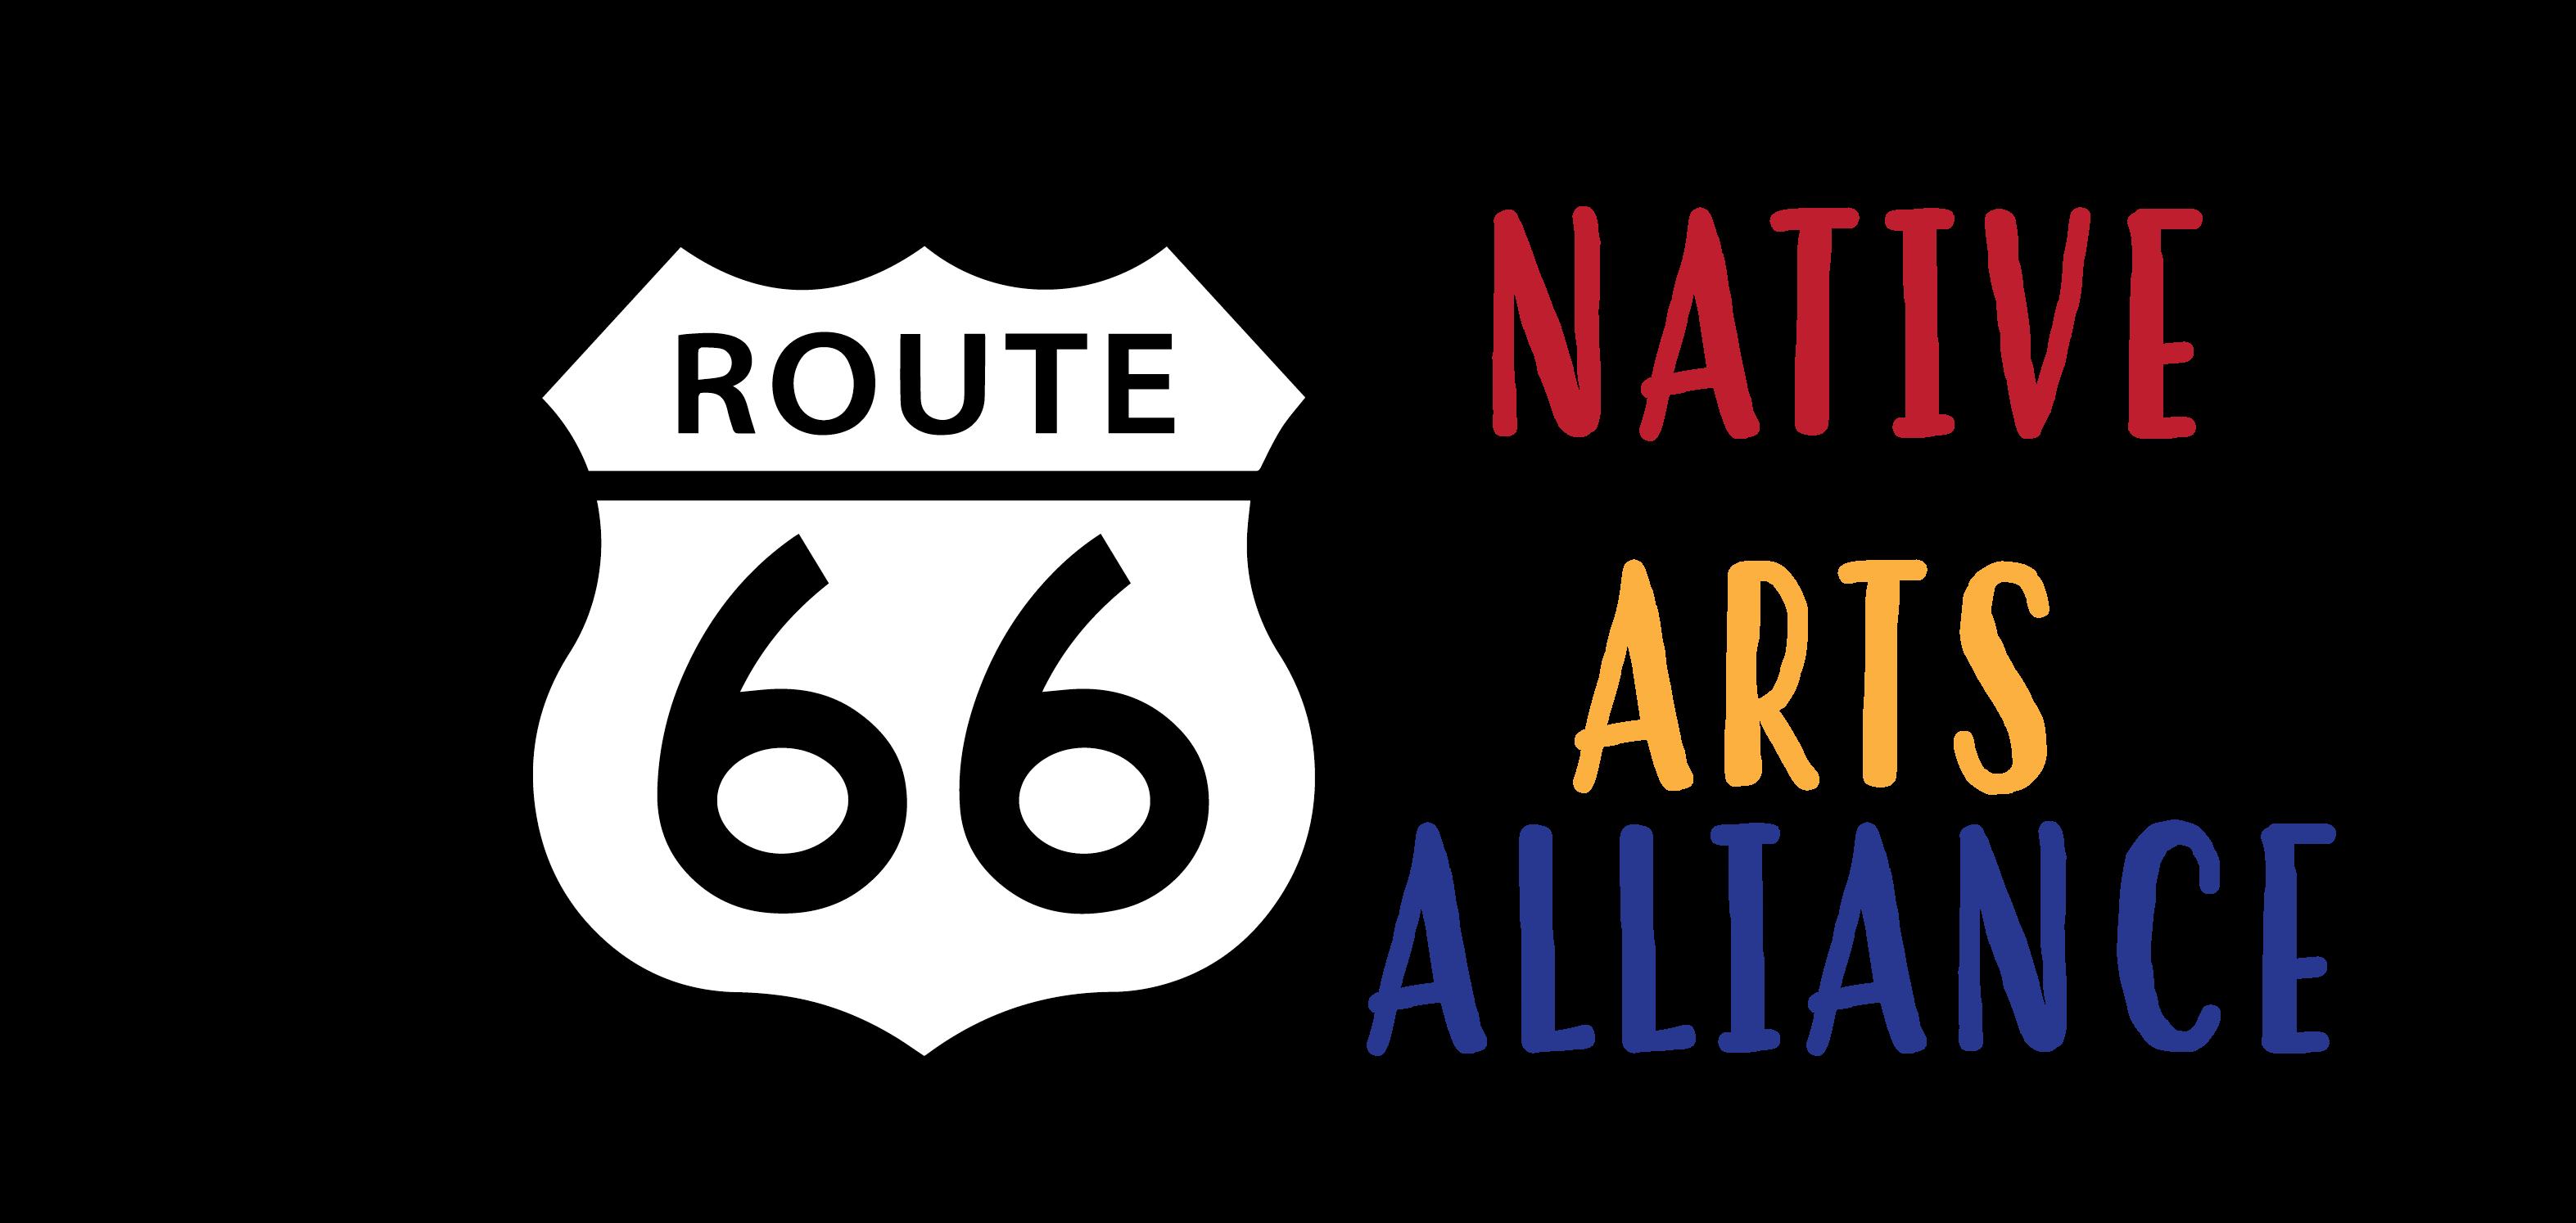 RT 66 Native Arts Alliance